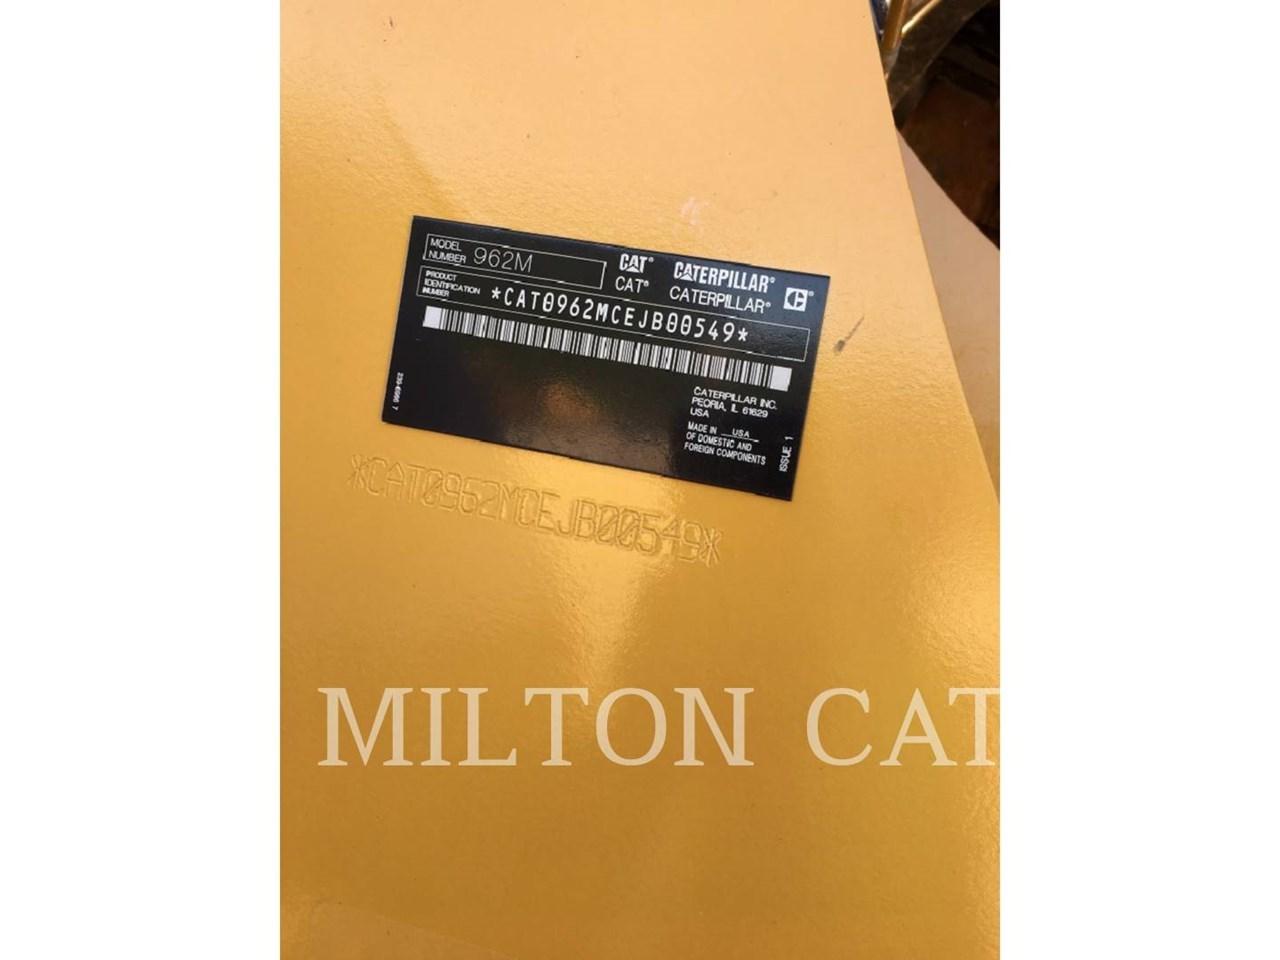 2016 Caterpillar 962M Image 6